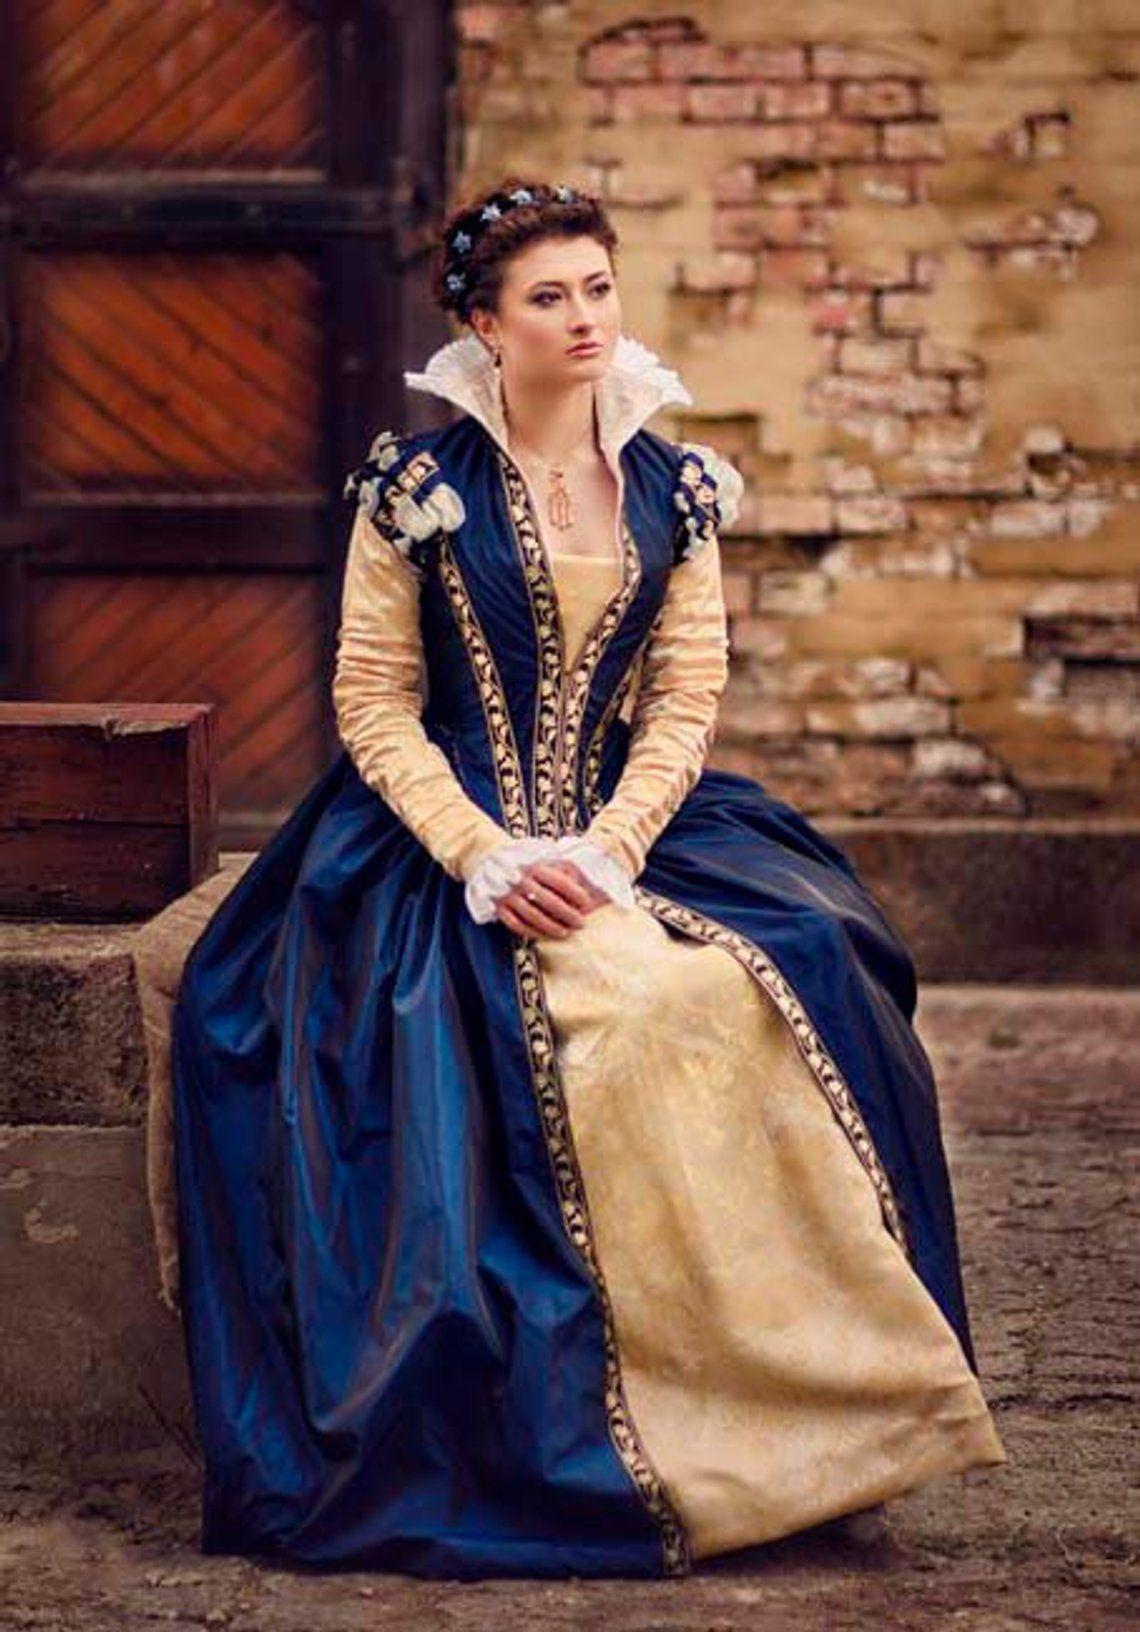 Dark Blue Taffeta Renaissance Dress, 16th Century Italy